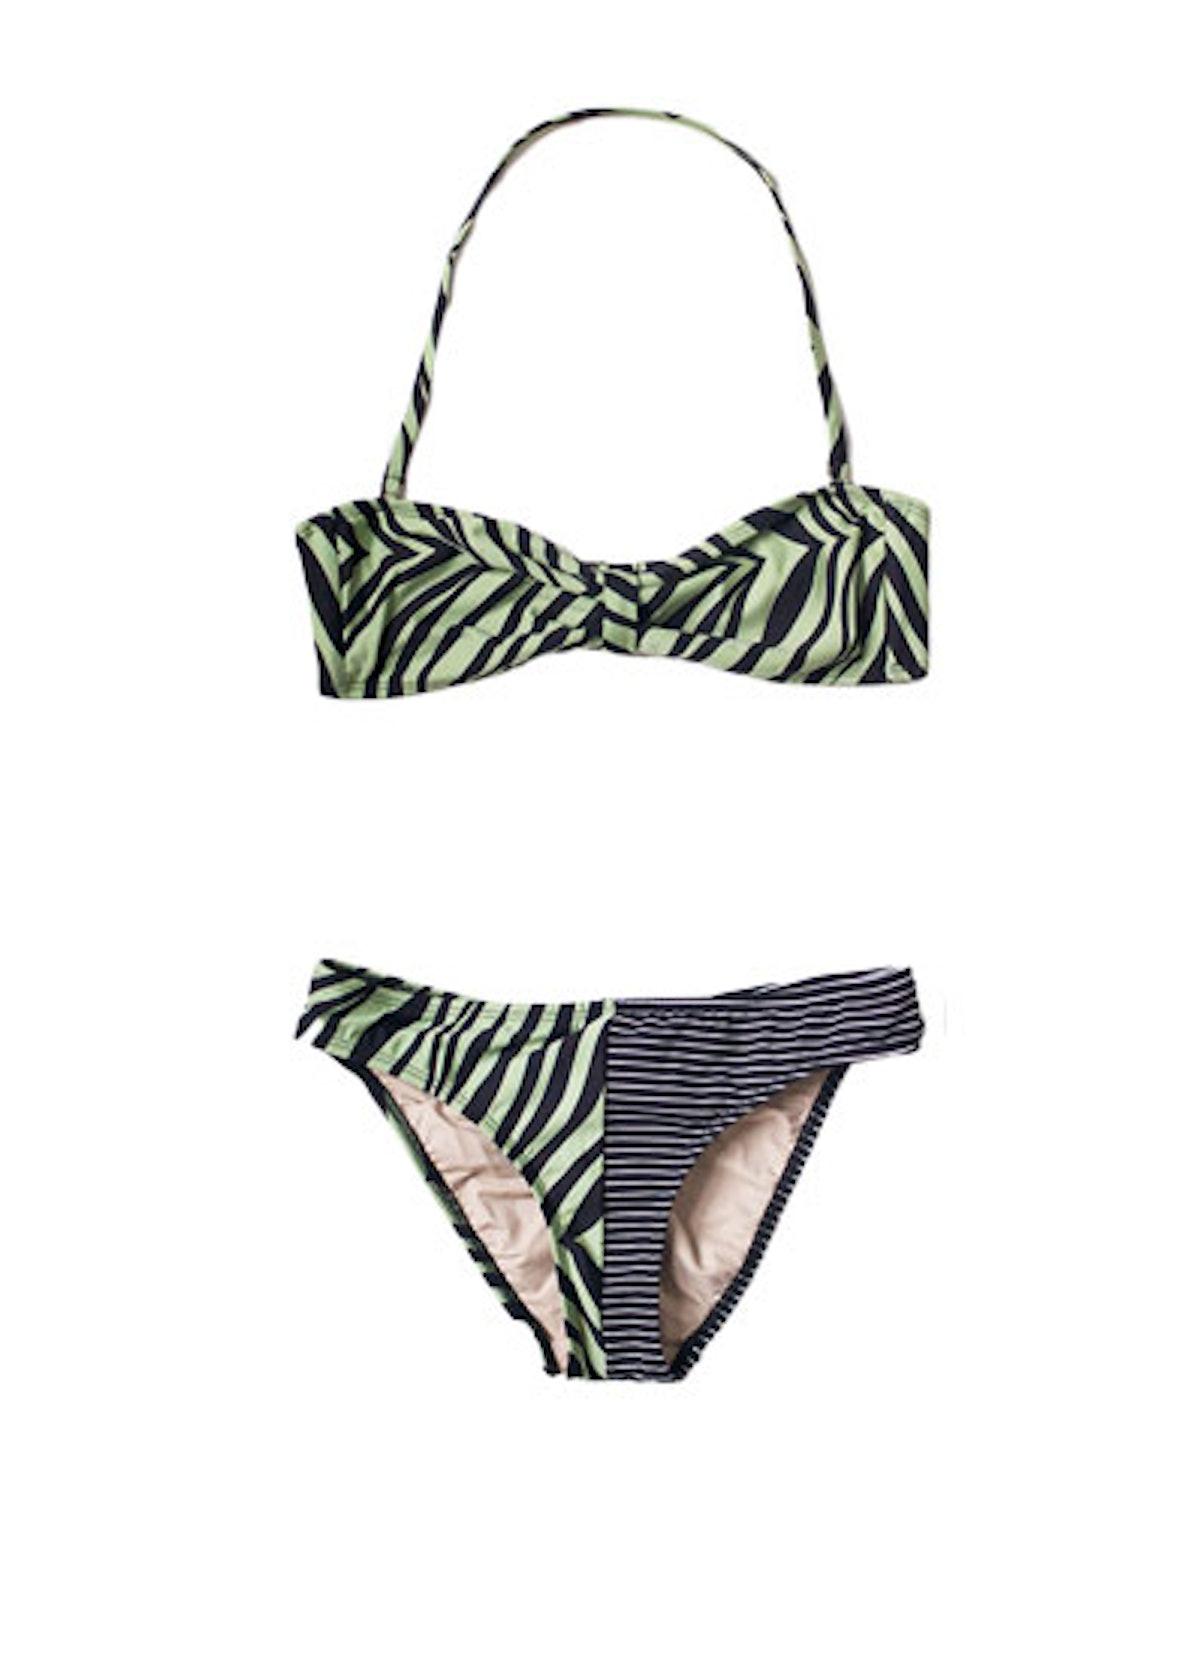 fass-animal-print-swimwear-trend-03-v.jpg